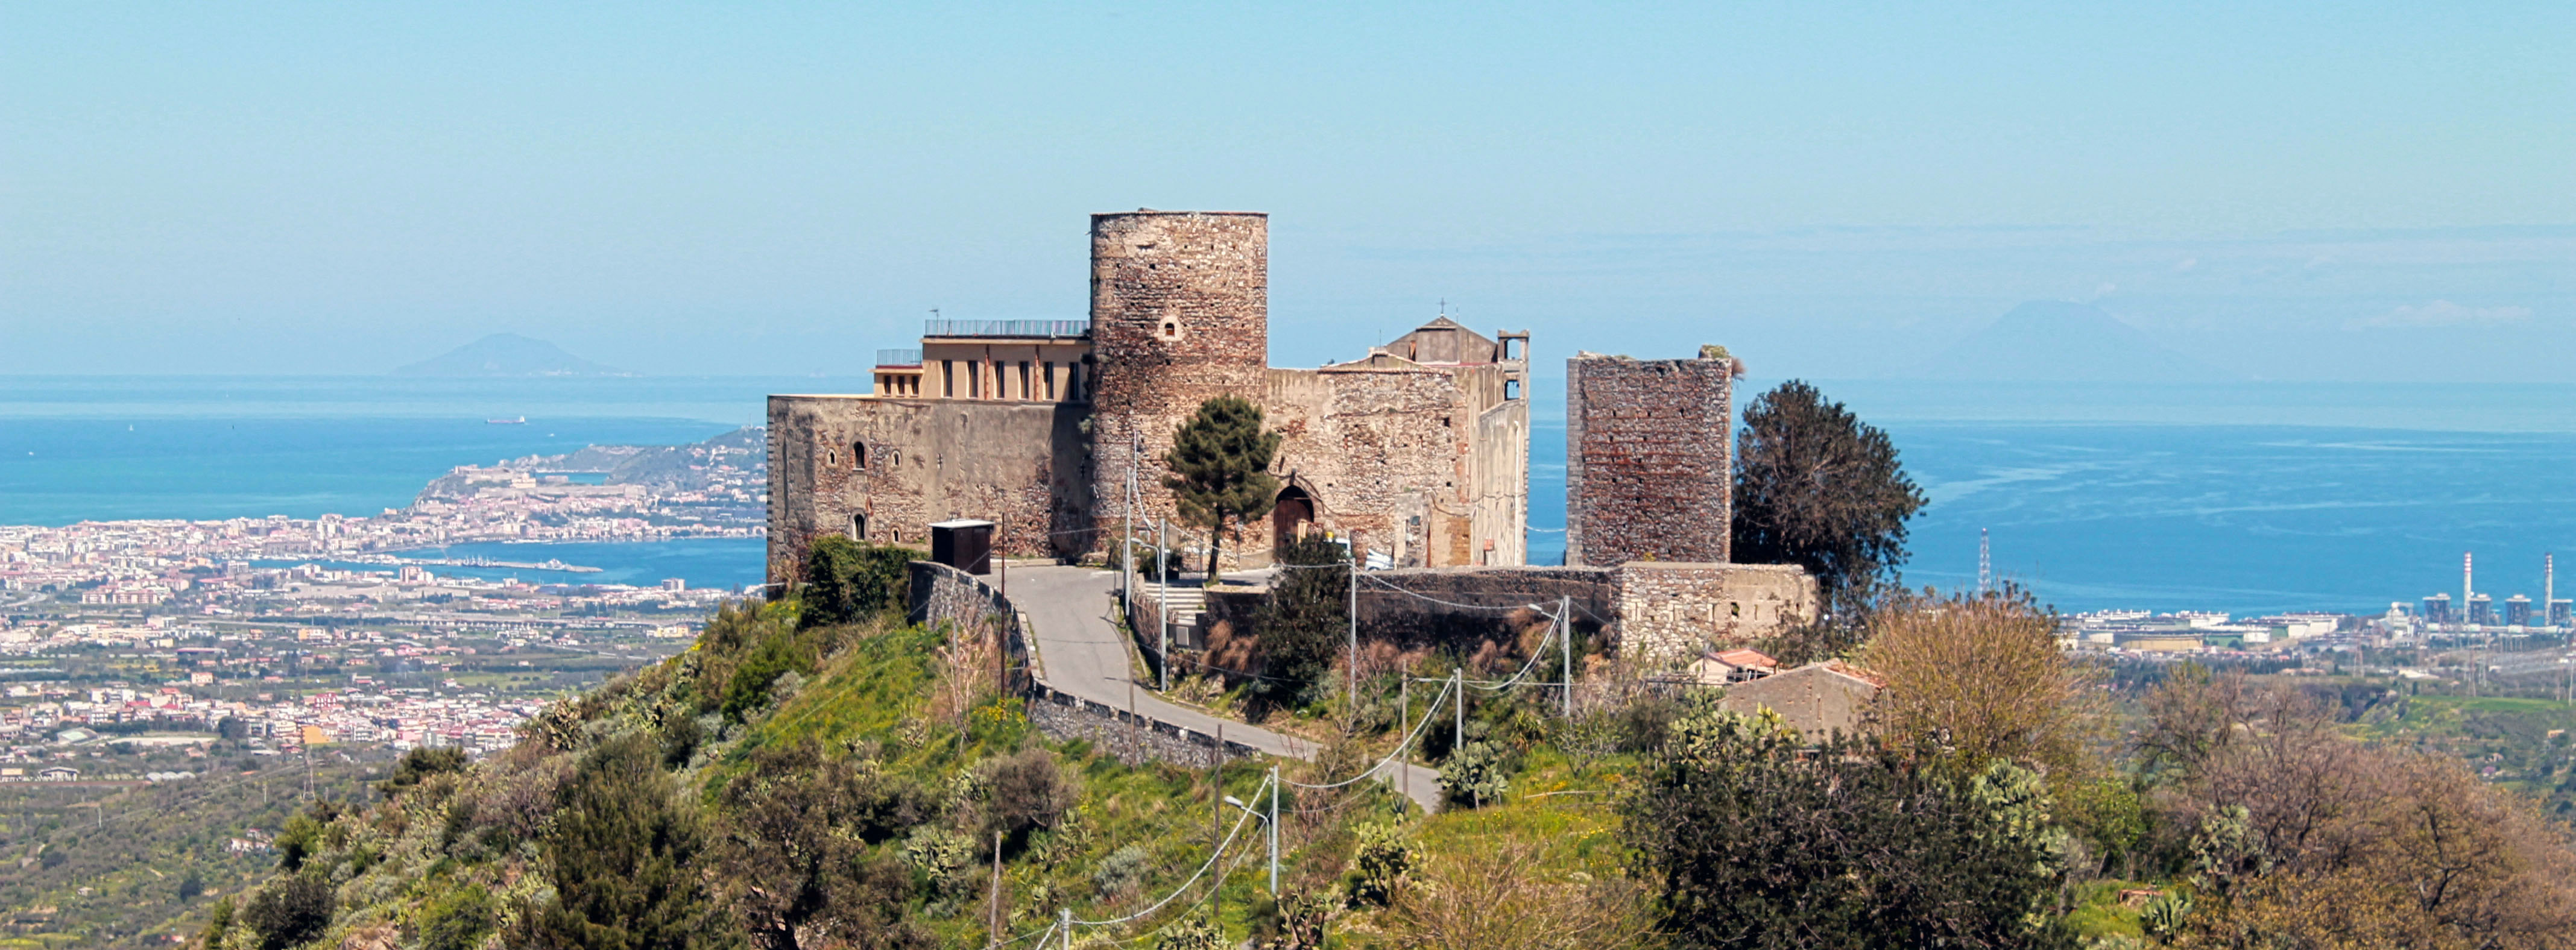 Santa Lucia del Mela Guide Turistiche Eolie Messina Taormina